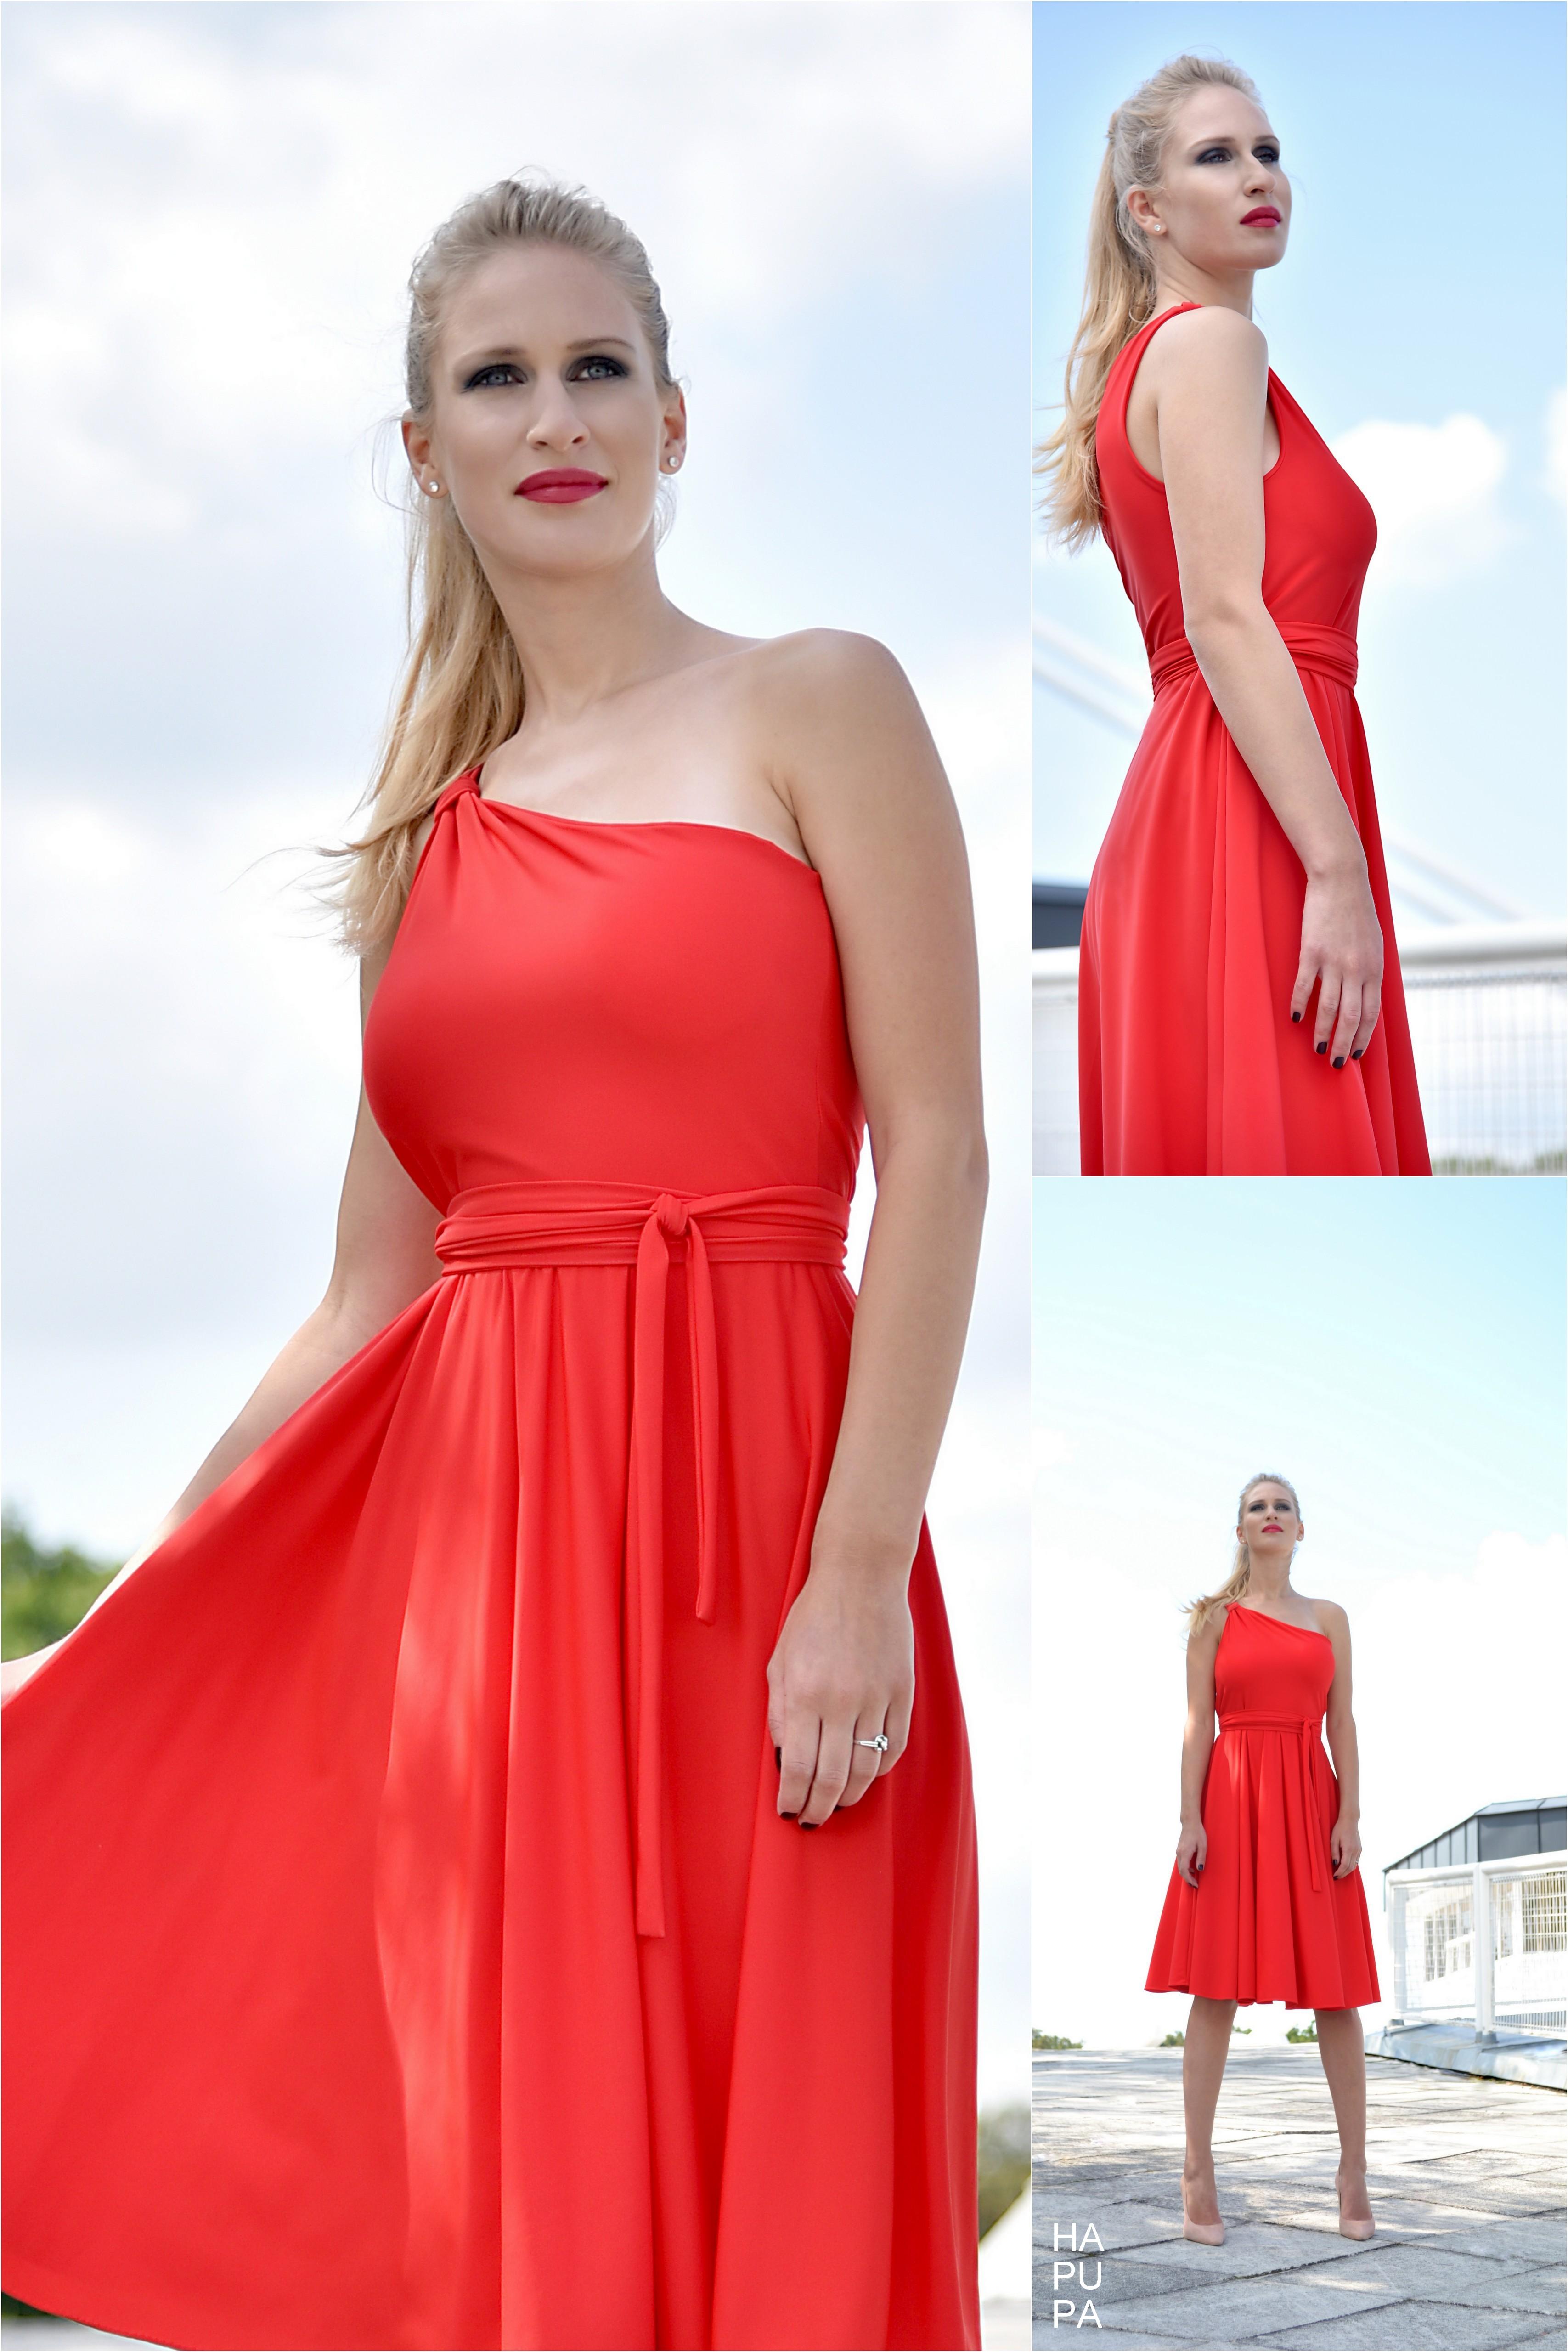 Fotografie pro model – Červené šaty najedno rameno